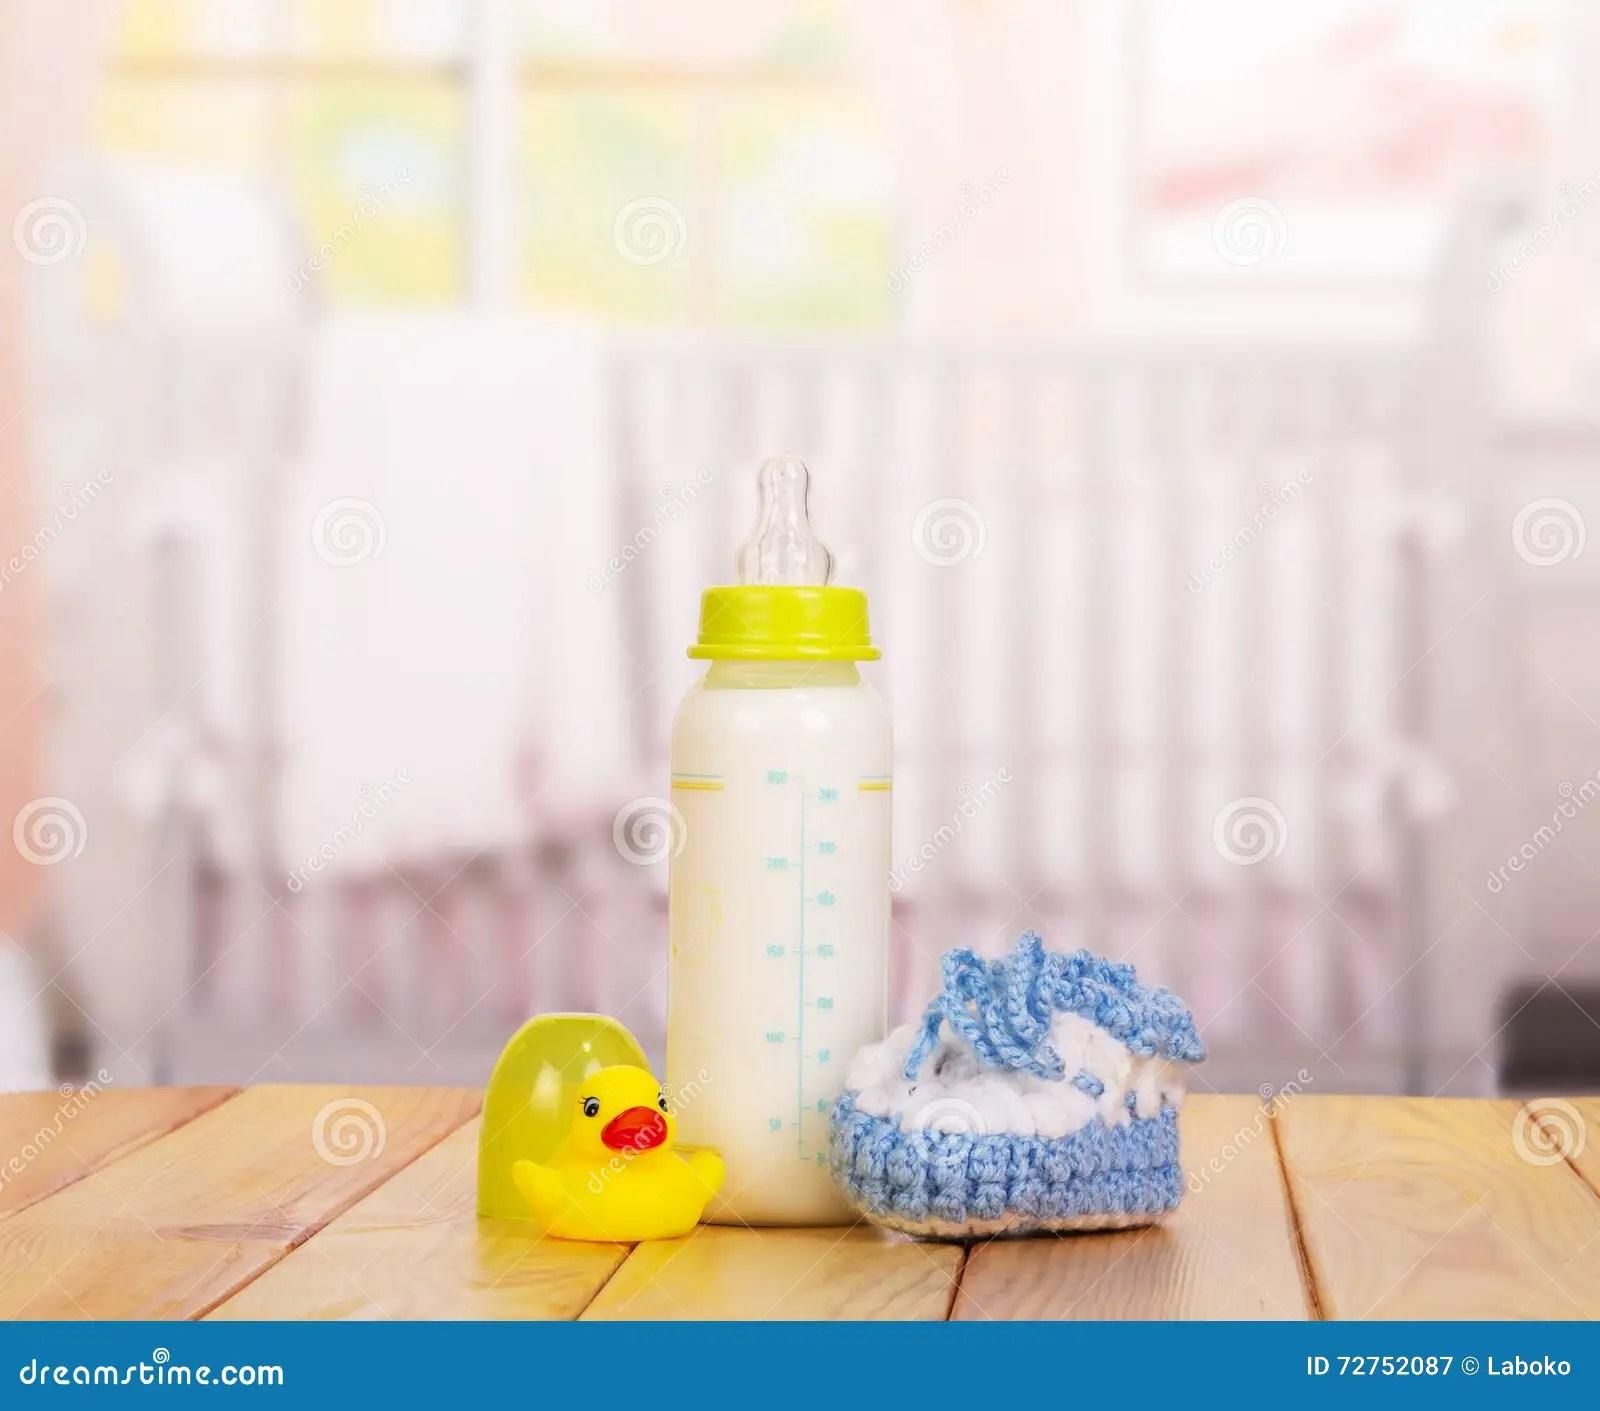 kitchen swags estimate for cabinets 瓶牛奶 蓝色赃物和橡胶鸭子在白色库存图片 图片包括有背包 每日 混合 一个瓶牛奶 蓝色赃物和橡胶鸭子在白色背景